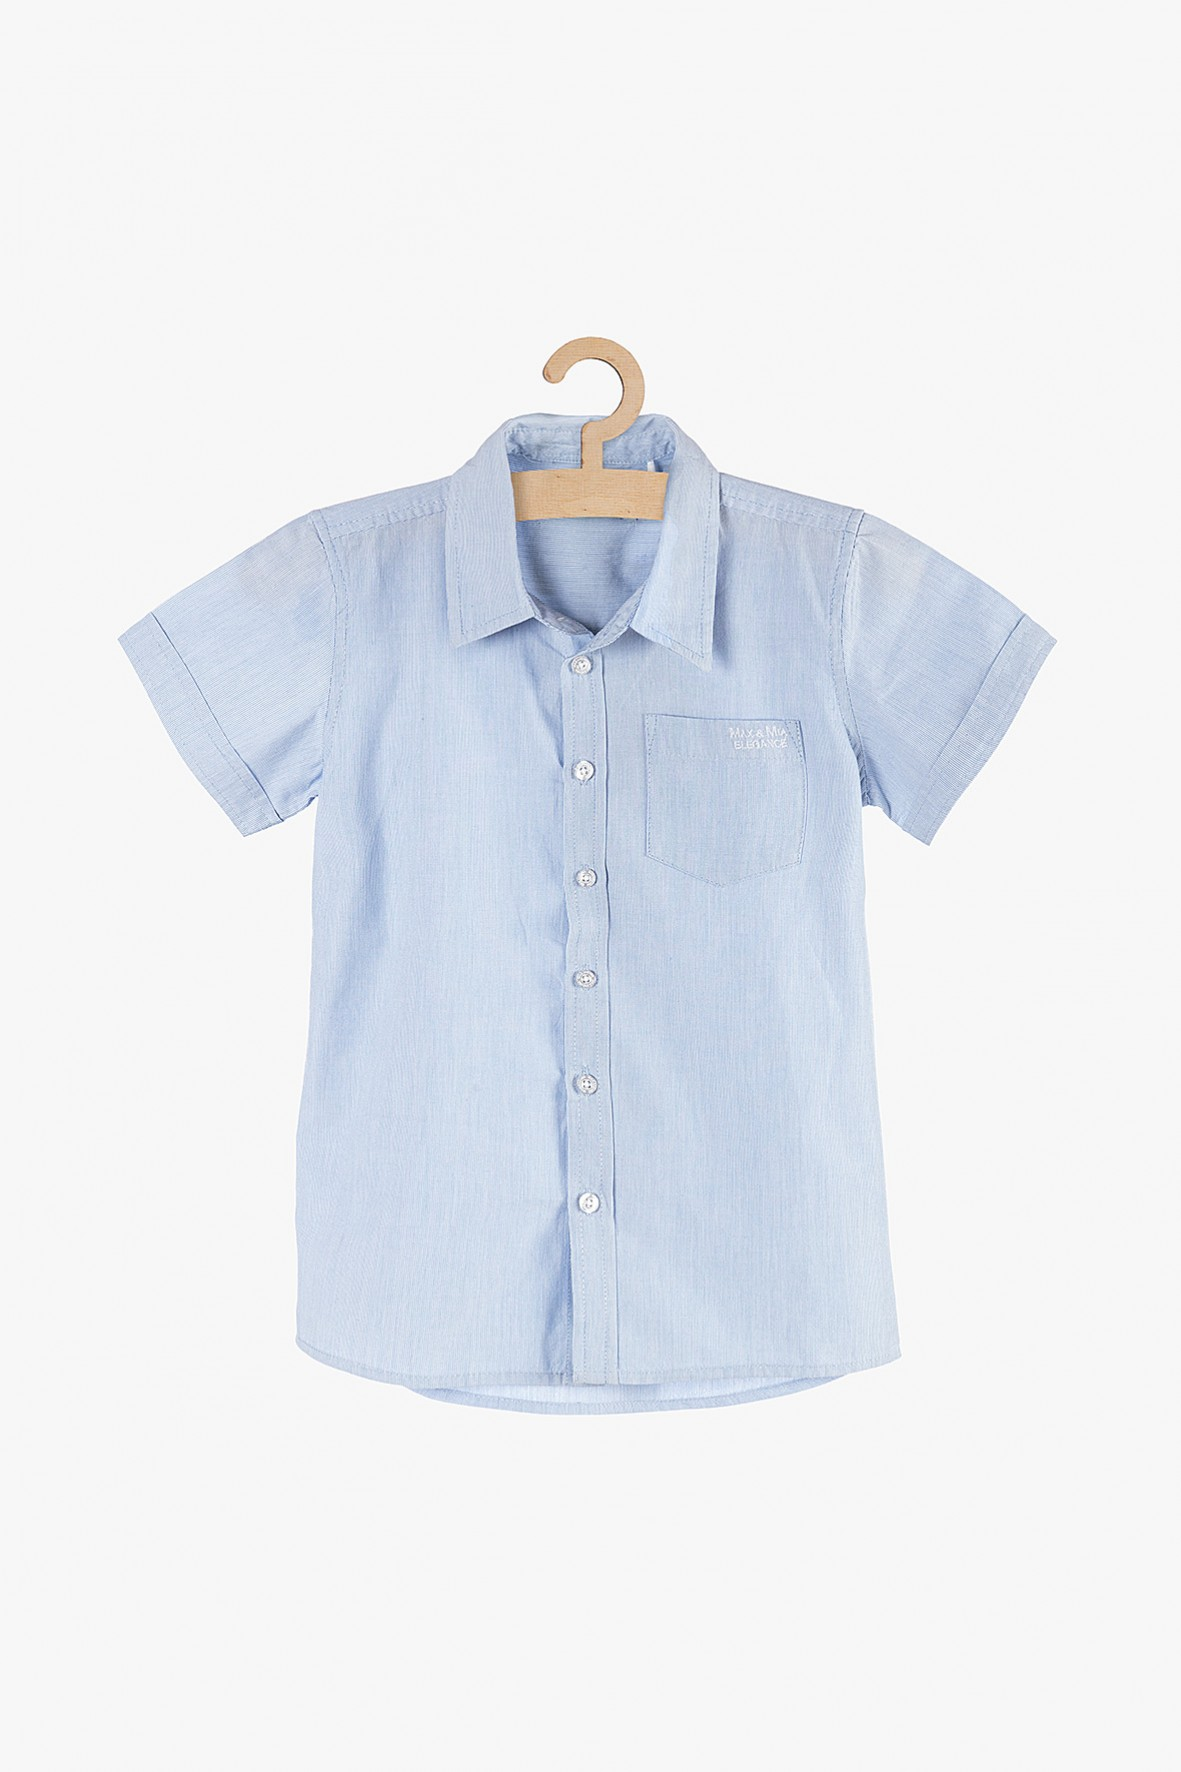 Elegancka koszula chłopięca niebieska z krótkim rękawem